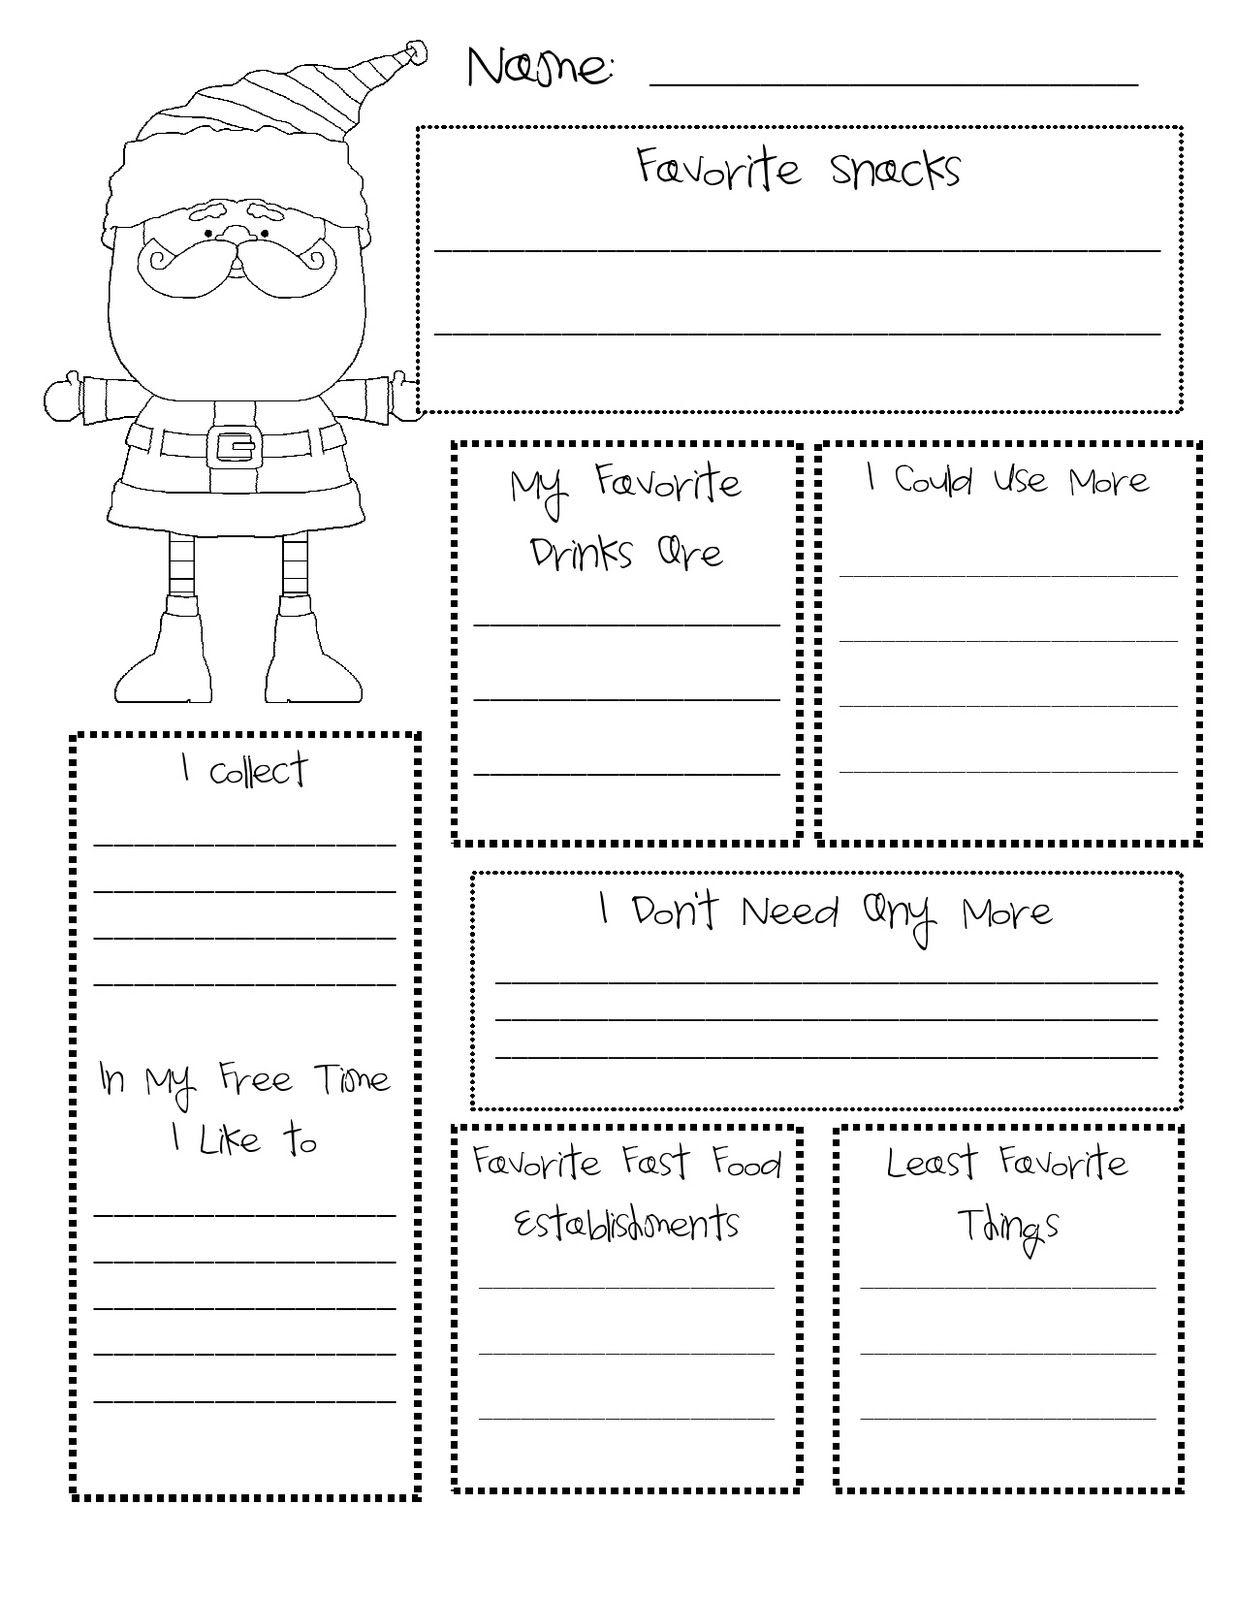 Build A Secret Santa Culture At Our School With Images